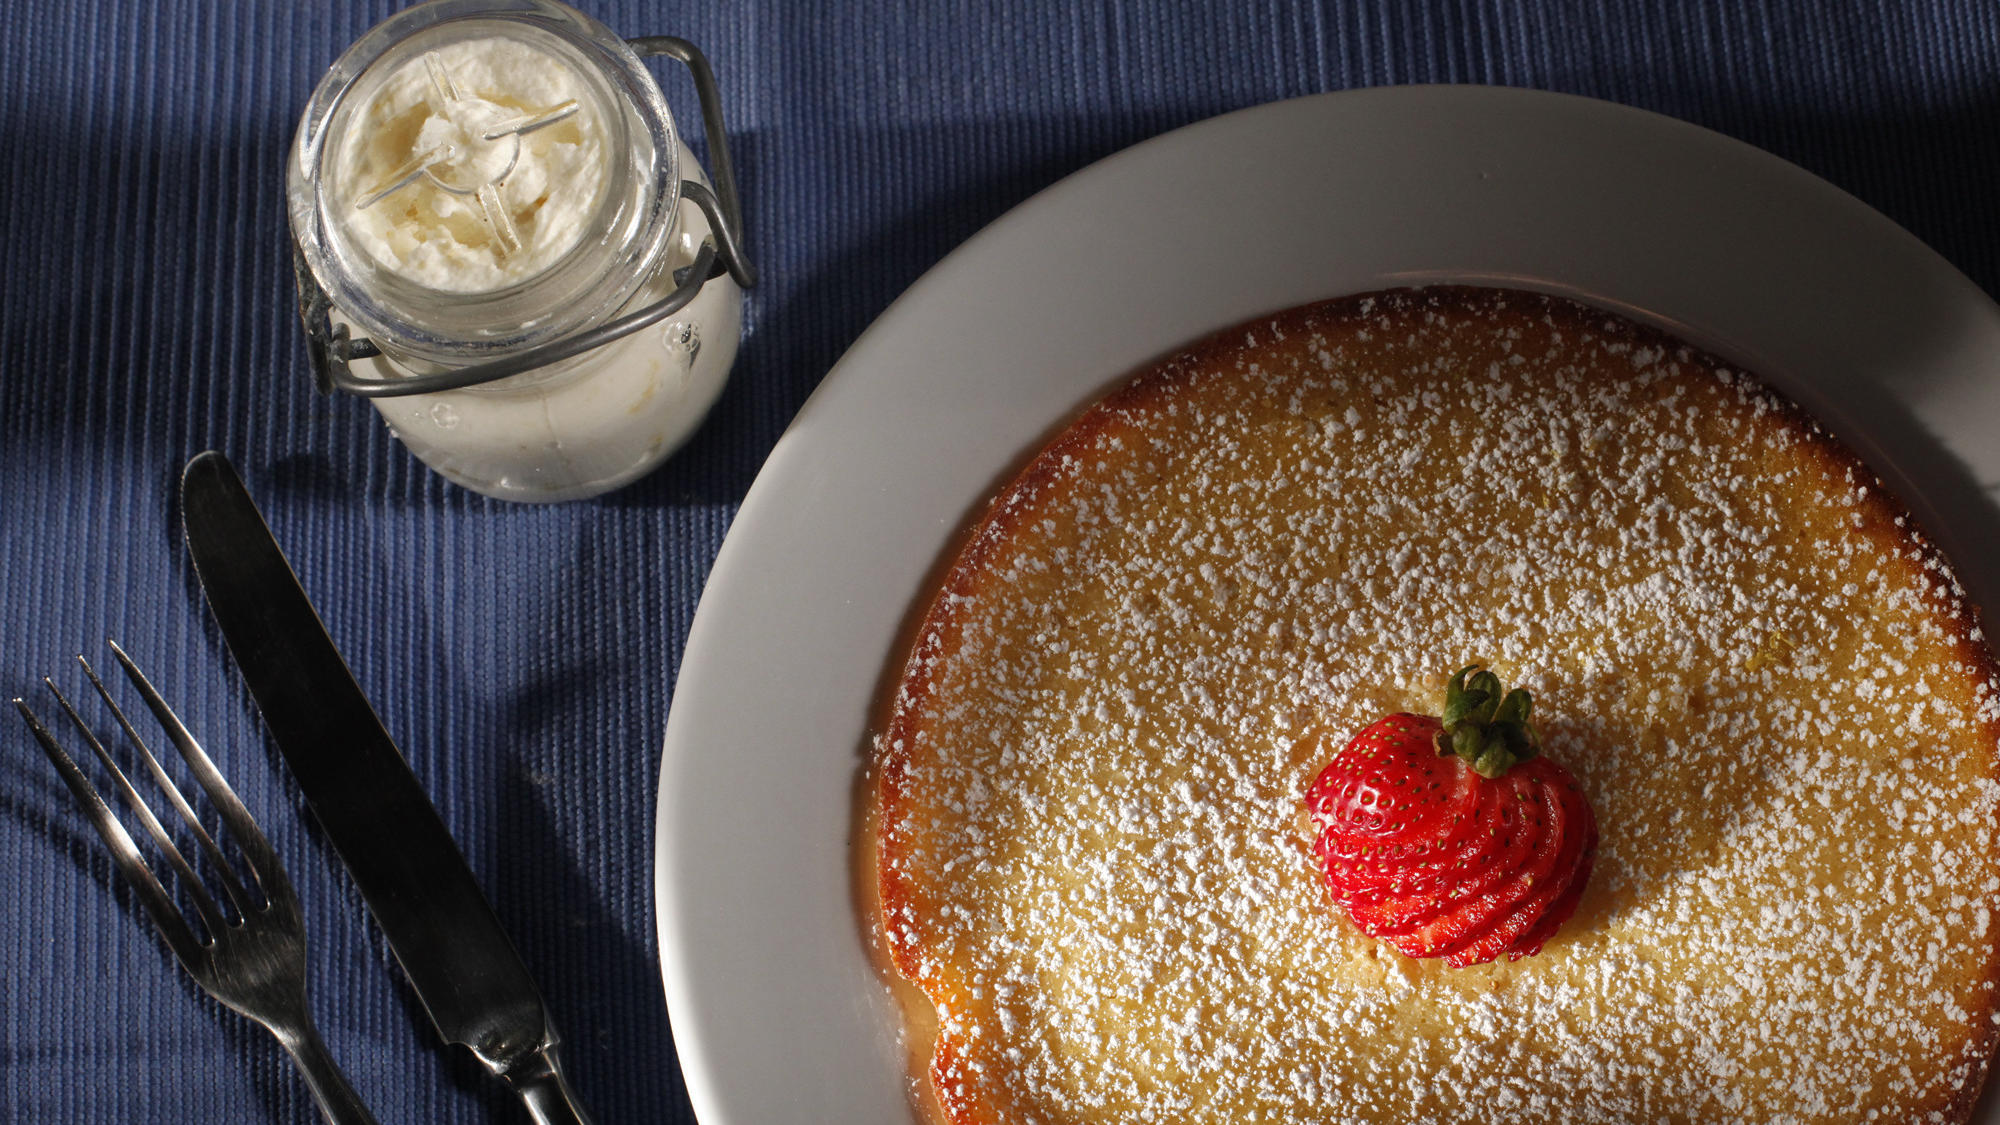 Icebox Cafe's lemon ricotta pancakes